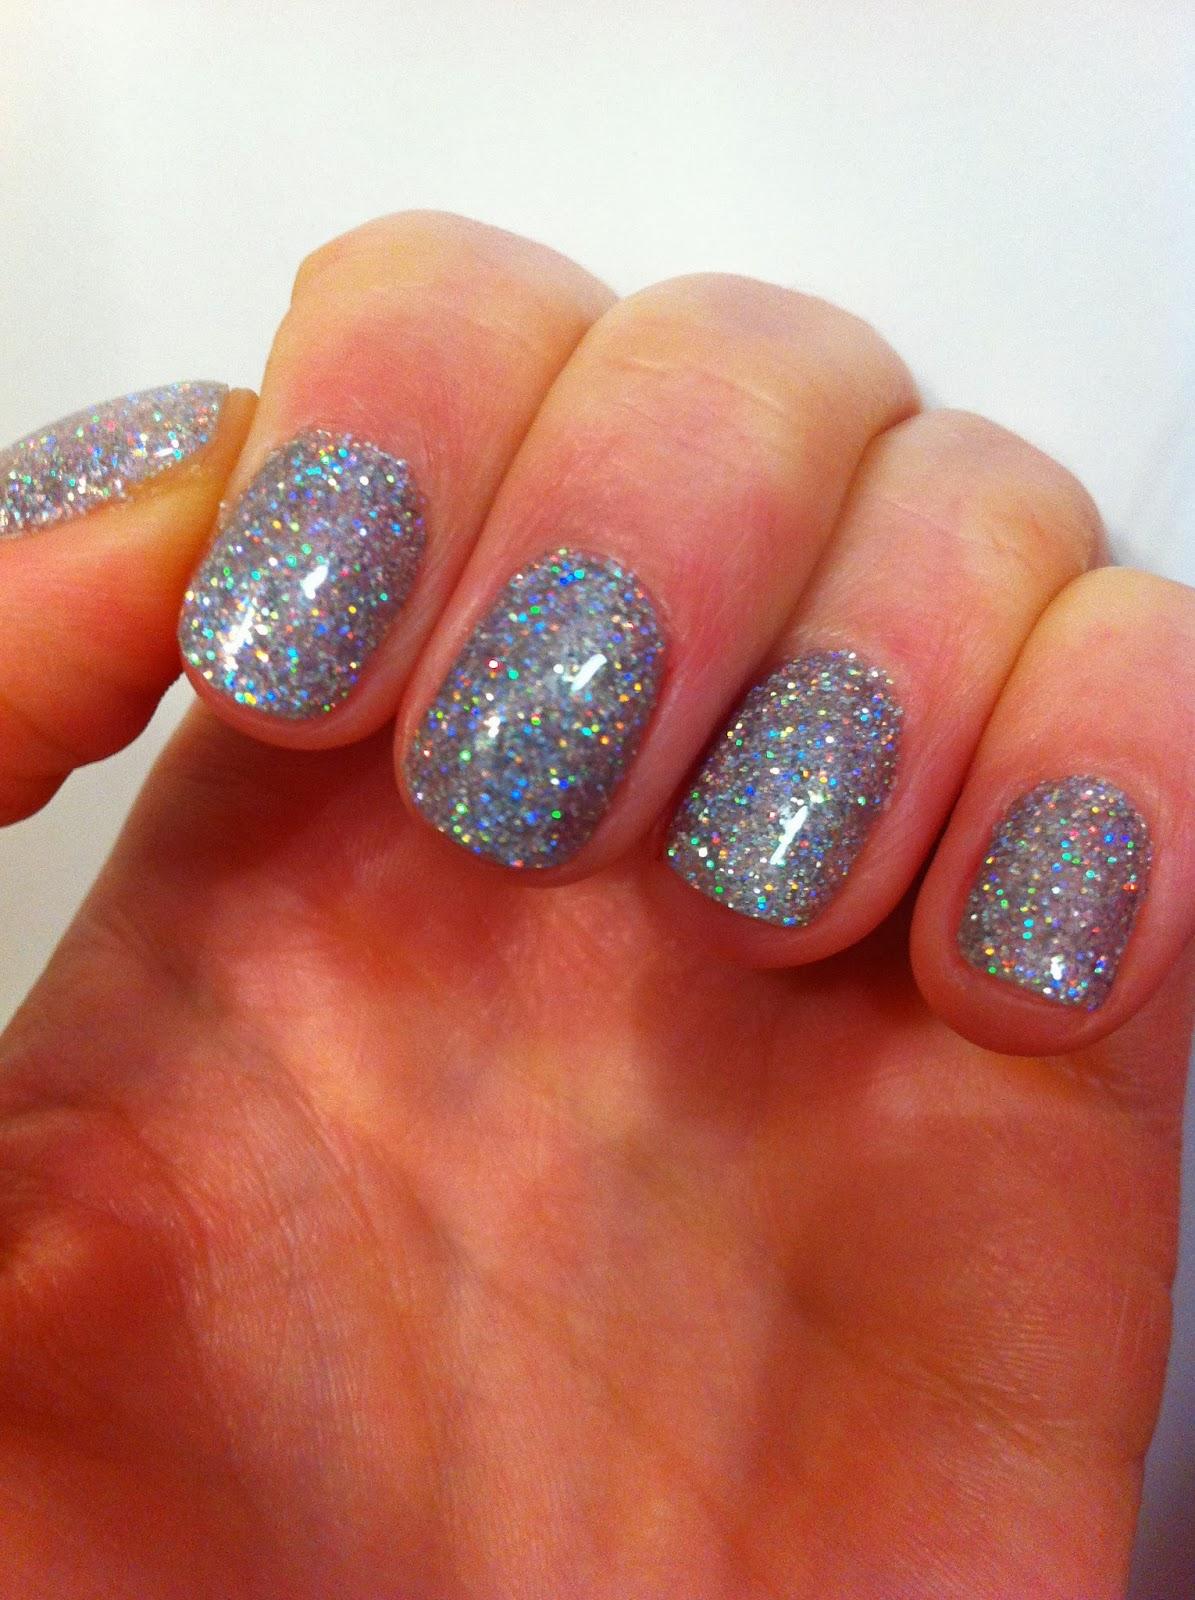 Glitter gel nails - Expression Nails